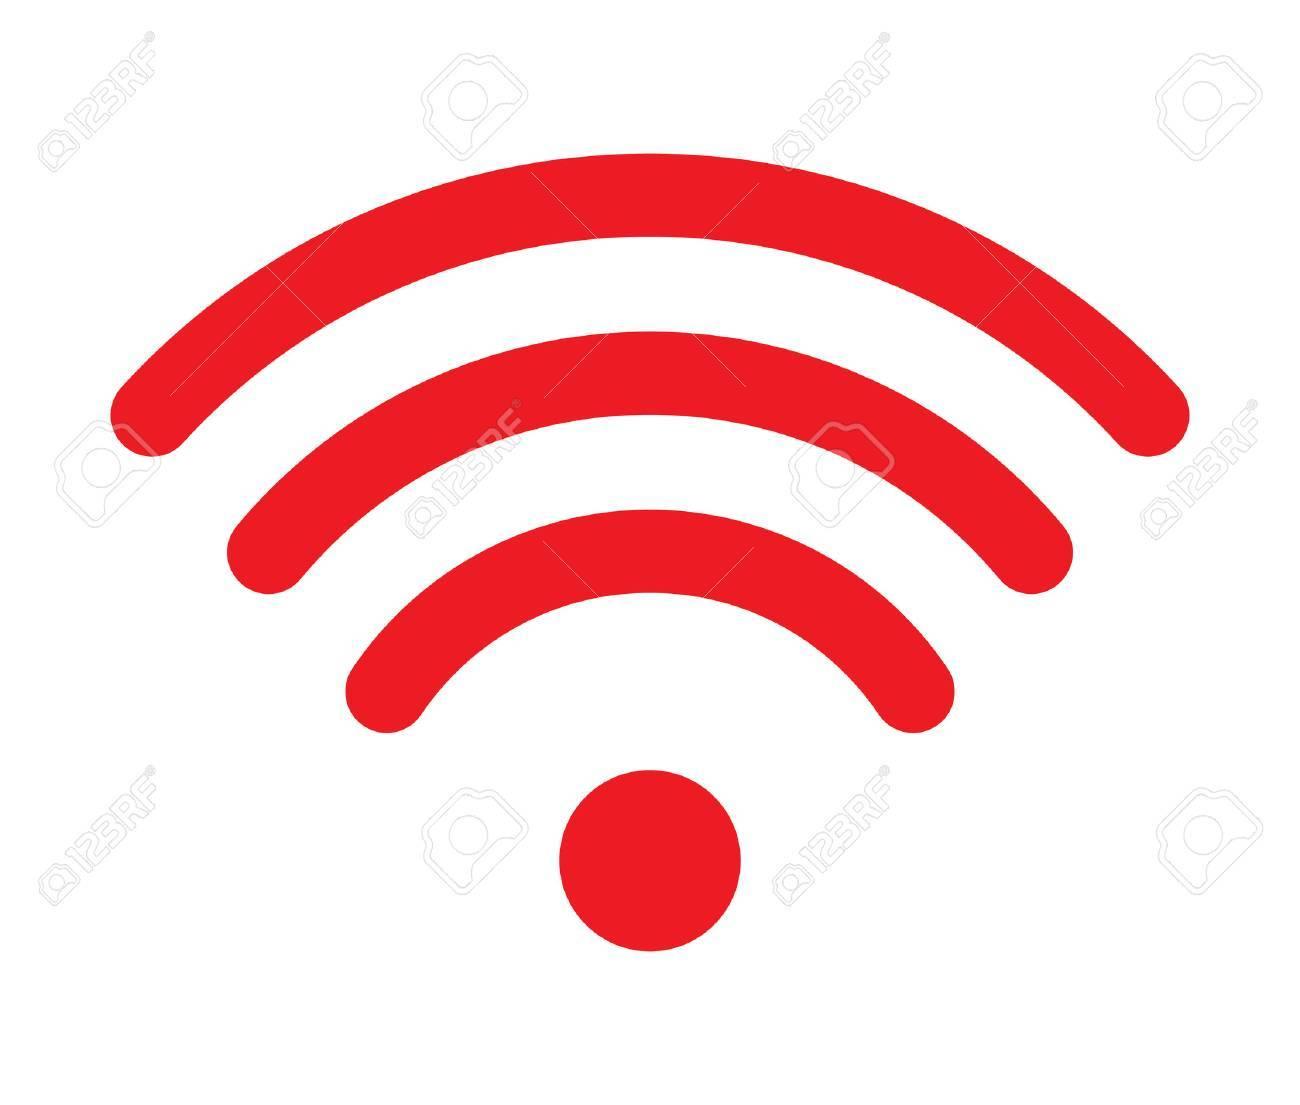 wi-fi symbol - 57958616